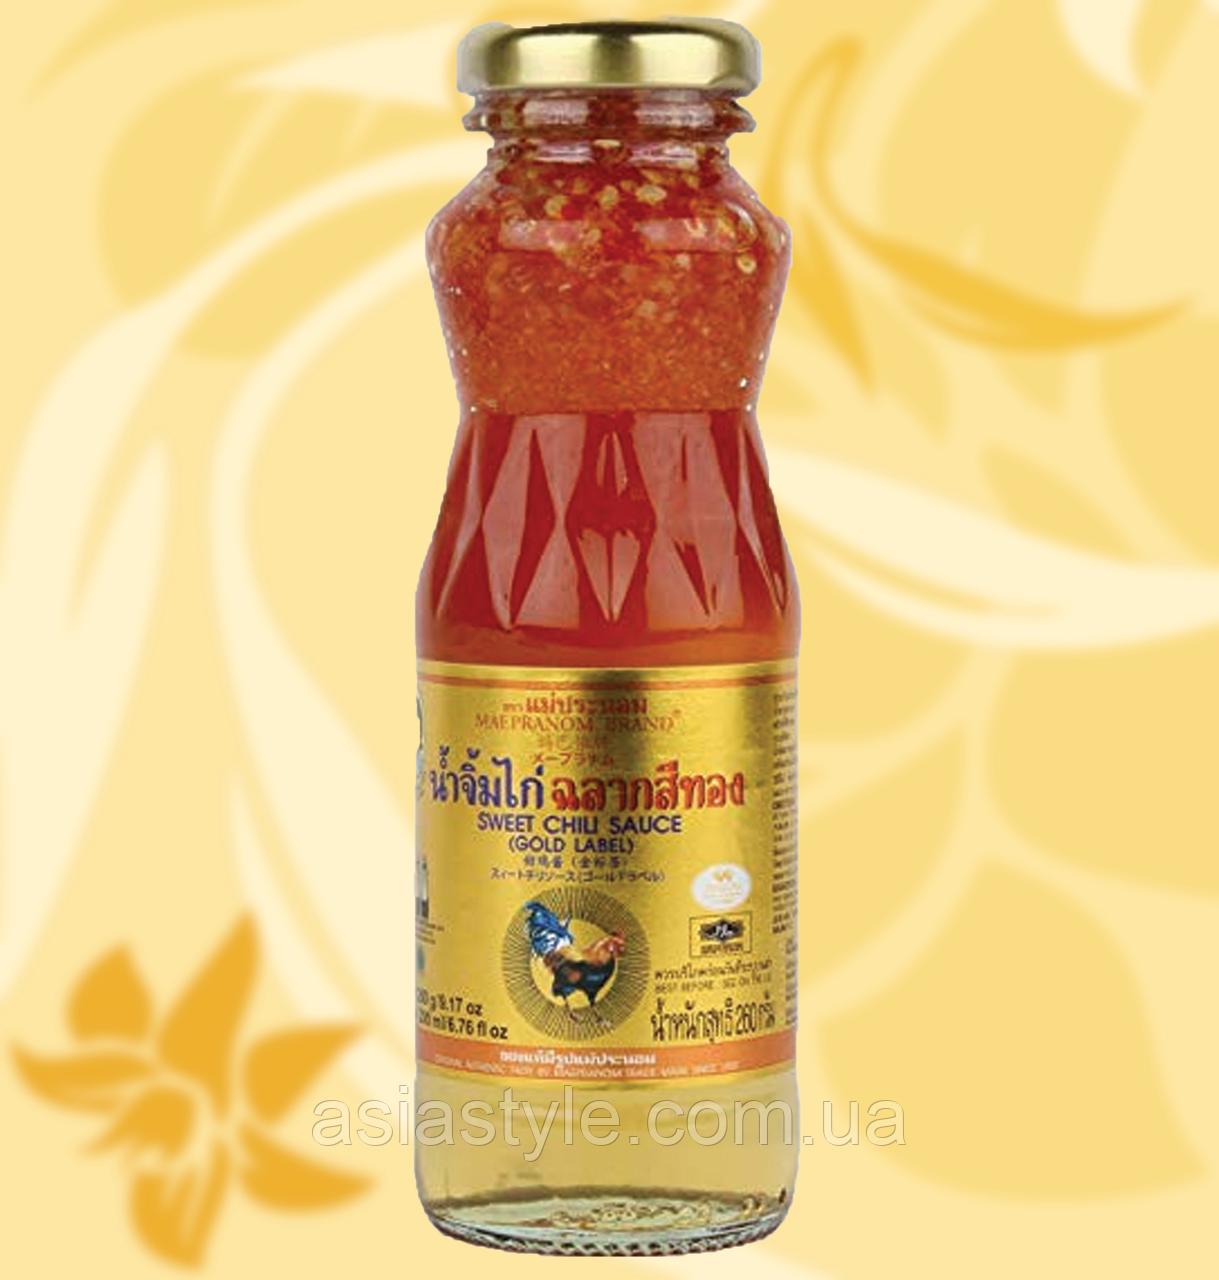 Соус Maepranom Brand Преміум (Golden Label) солодкий чилі 200мл Фо